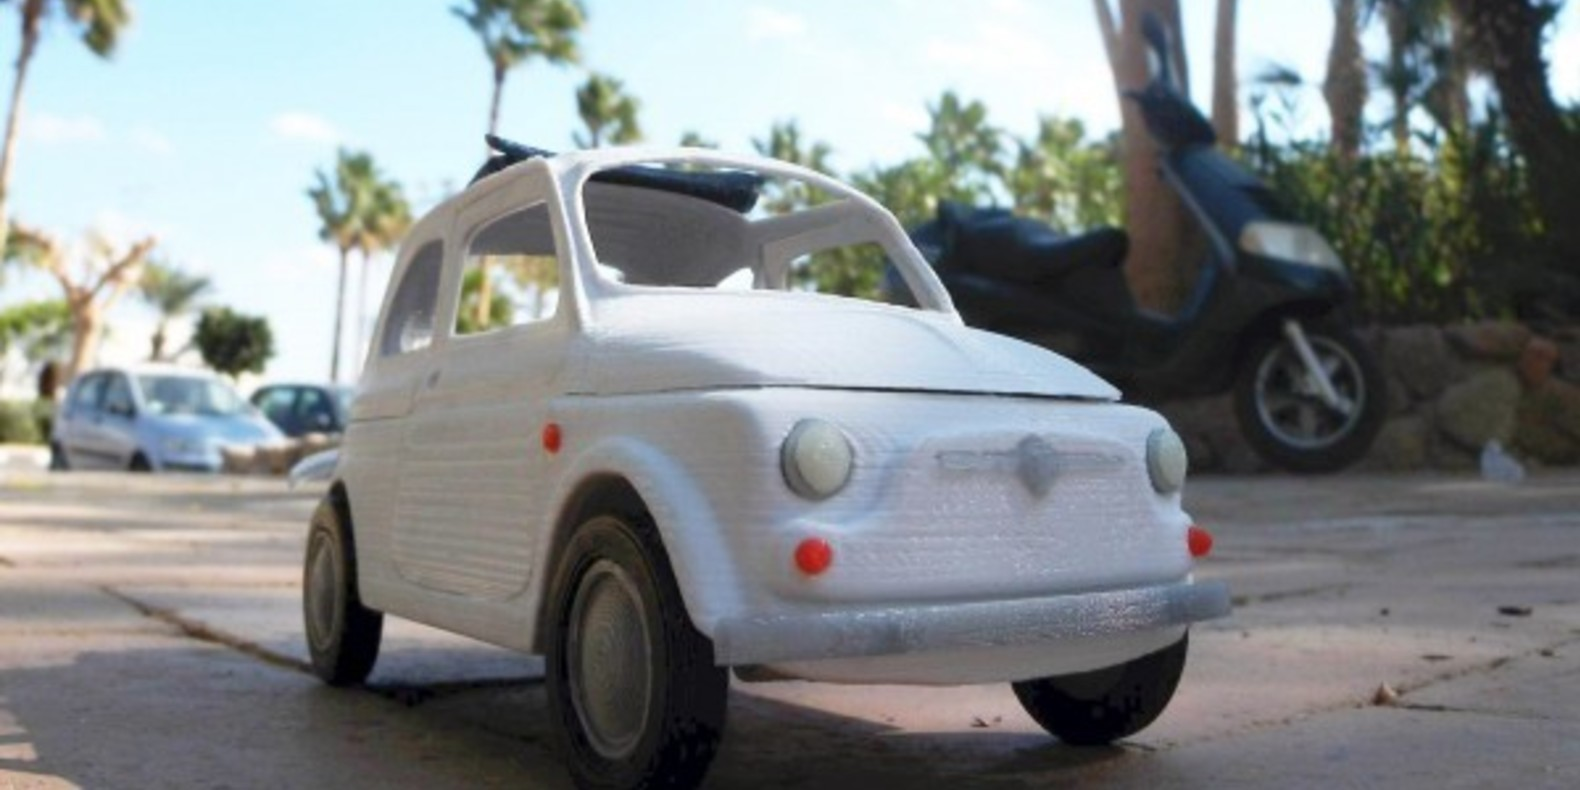 Italian Sixties Car 1 - Mao Casella - Cults modélisme 3D printing Impression 3D Fichier 3D